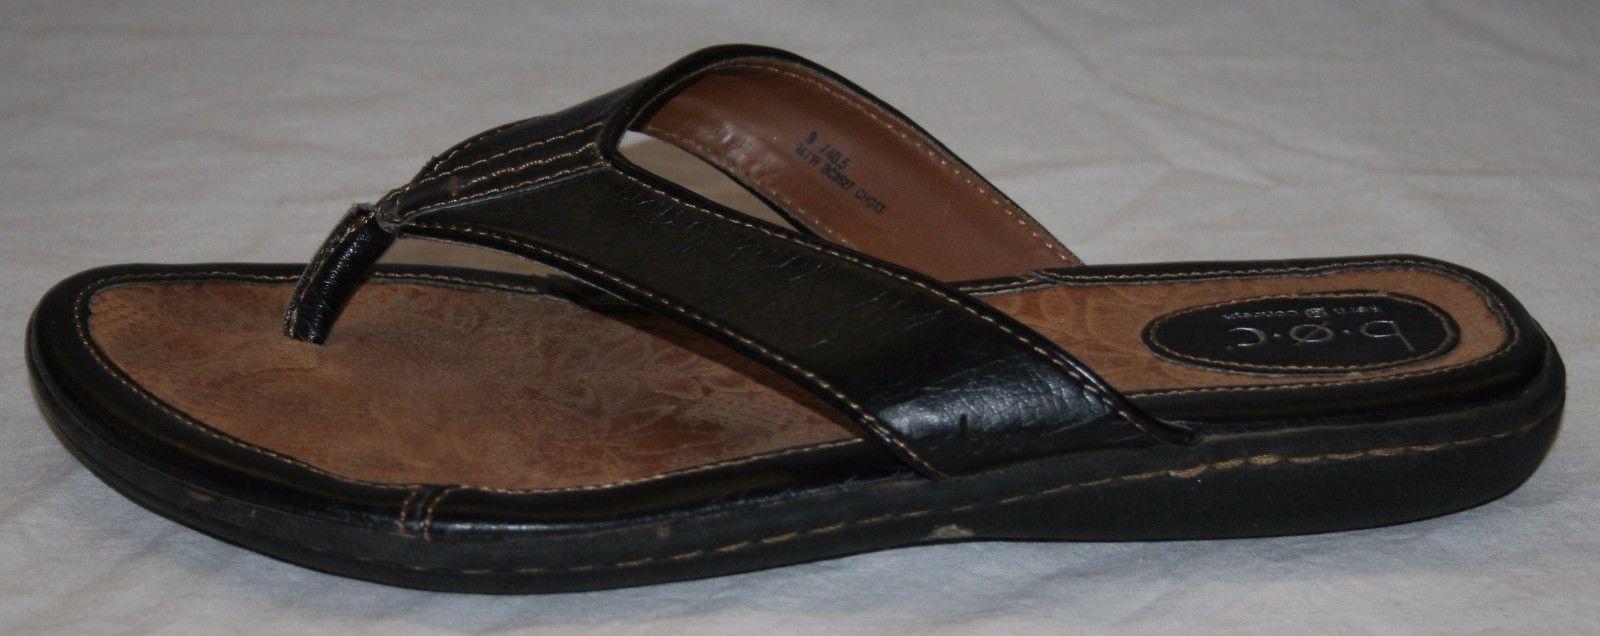 6a3ee8546b4 B.O.C. Born Concept BOC Black Leather Thong Flip Flops Womens Sandals 9 40.5